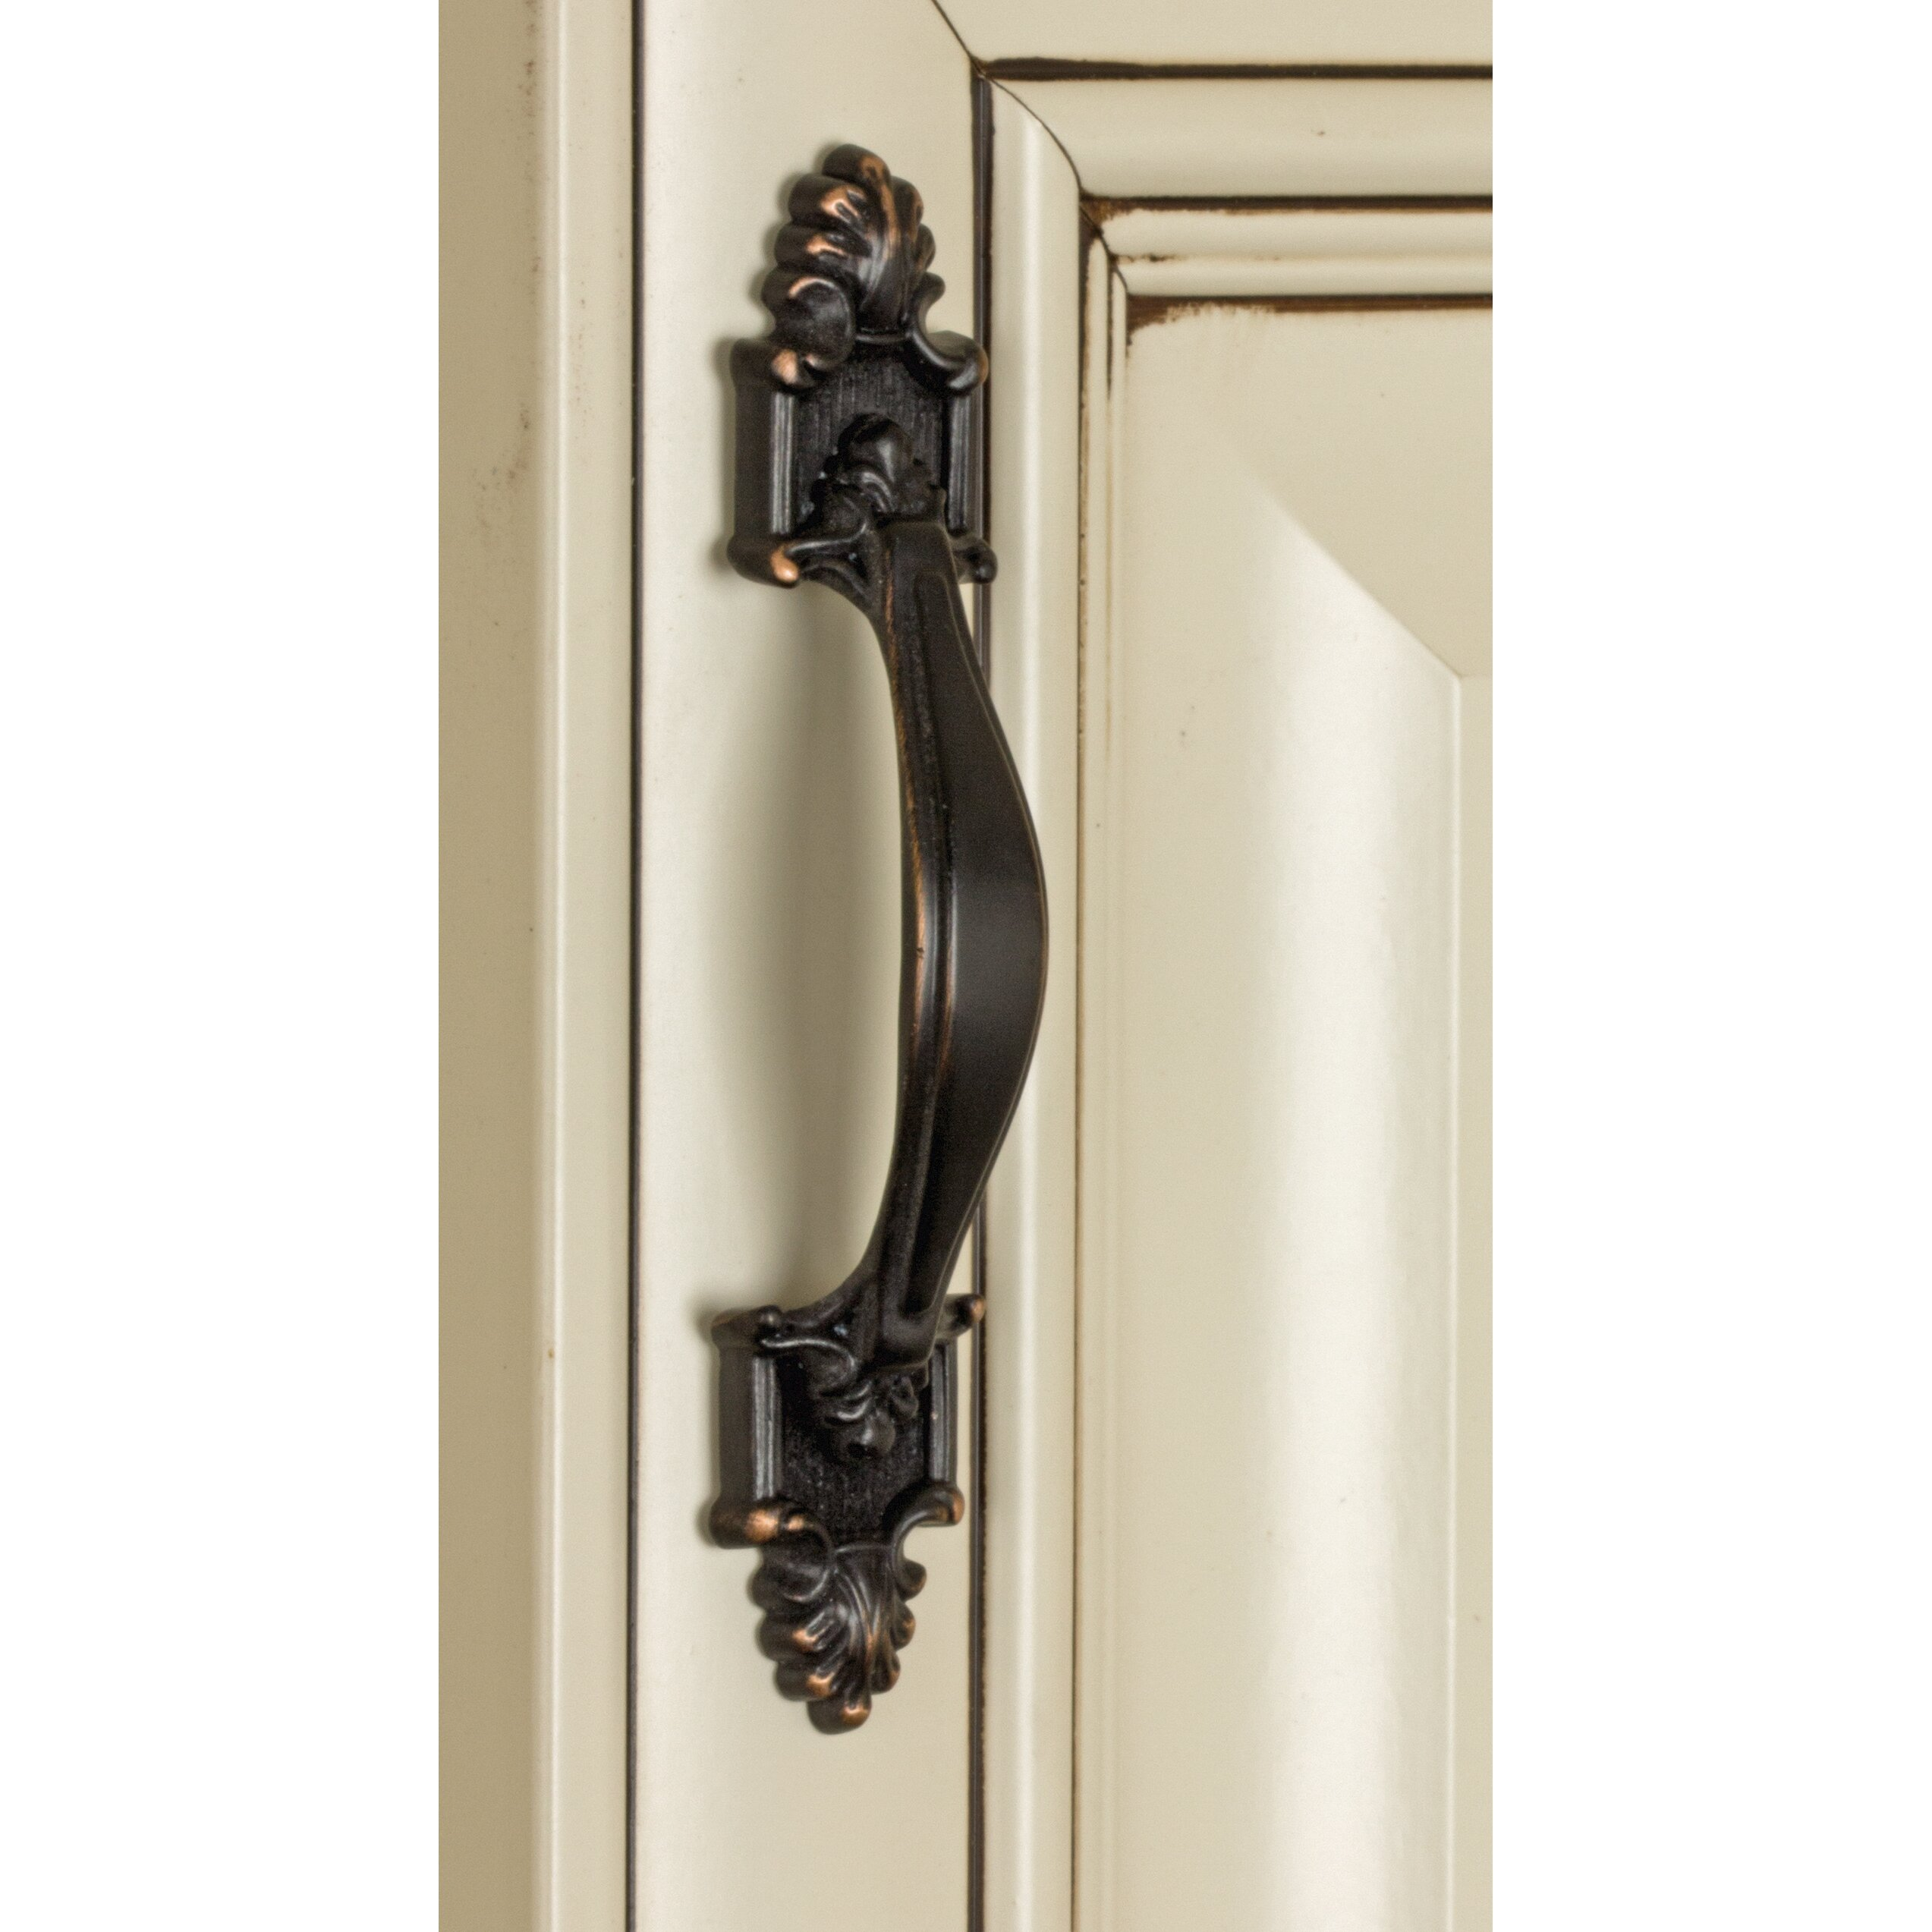 gliderite hardware classic deco 3 1 2 center arch pull reviews wayfair. Black Bedroom Furniture Sets. Home Design Ideas